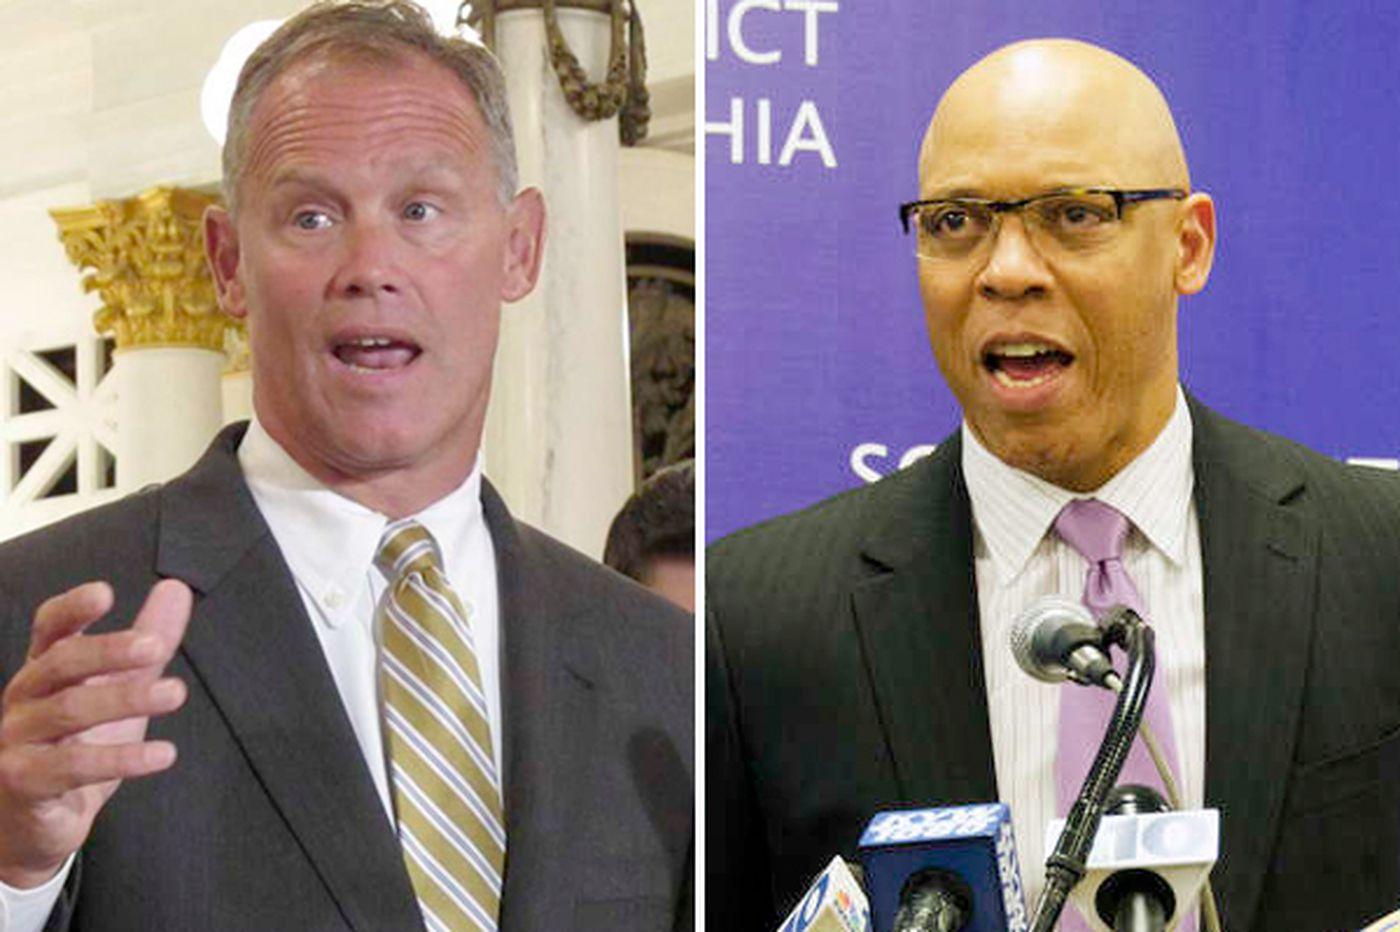 New assurance, same deadline for Philly schools